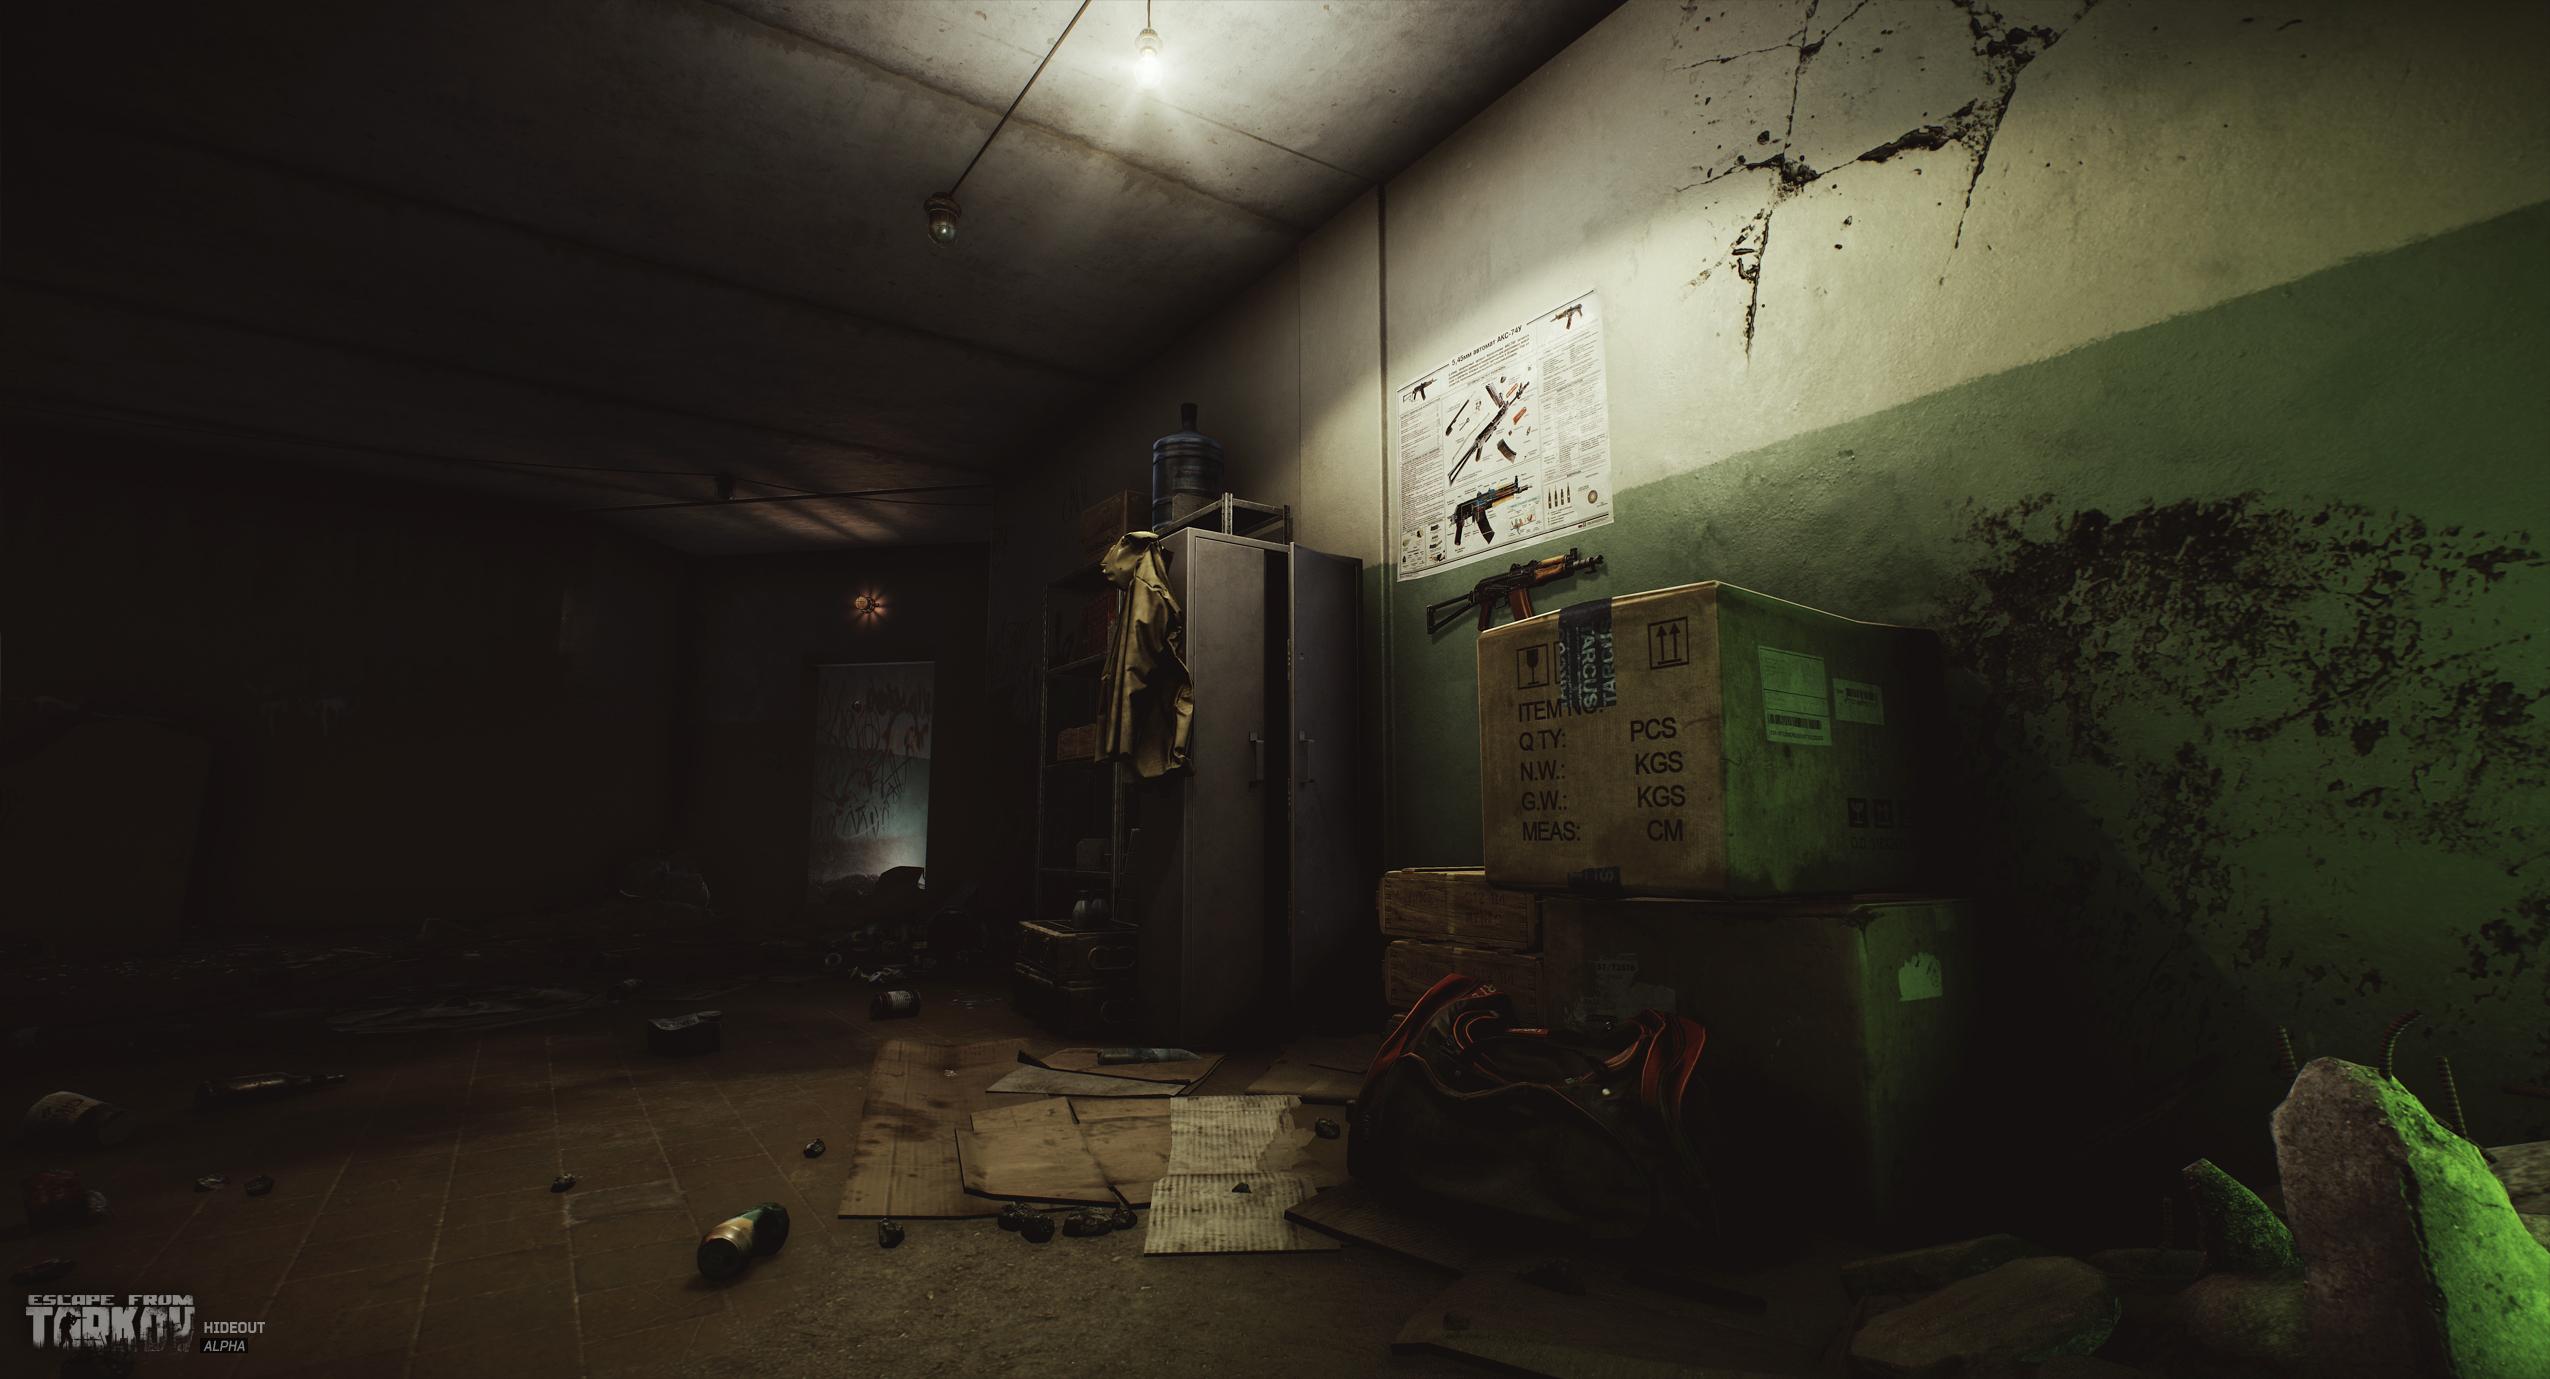 escapefromtarkov_hideout6.jpg